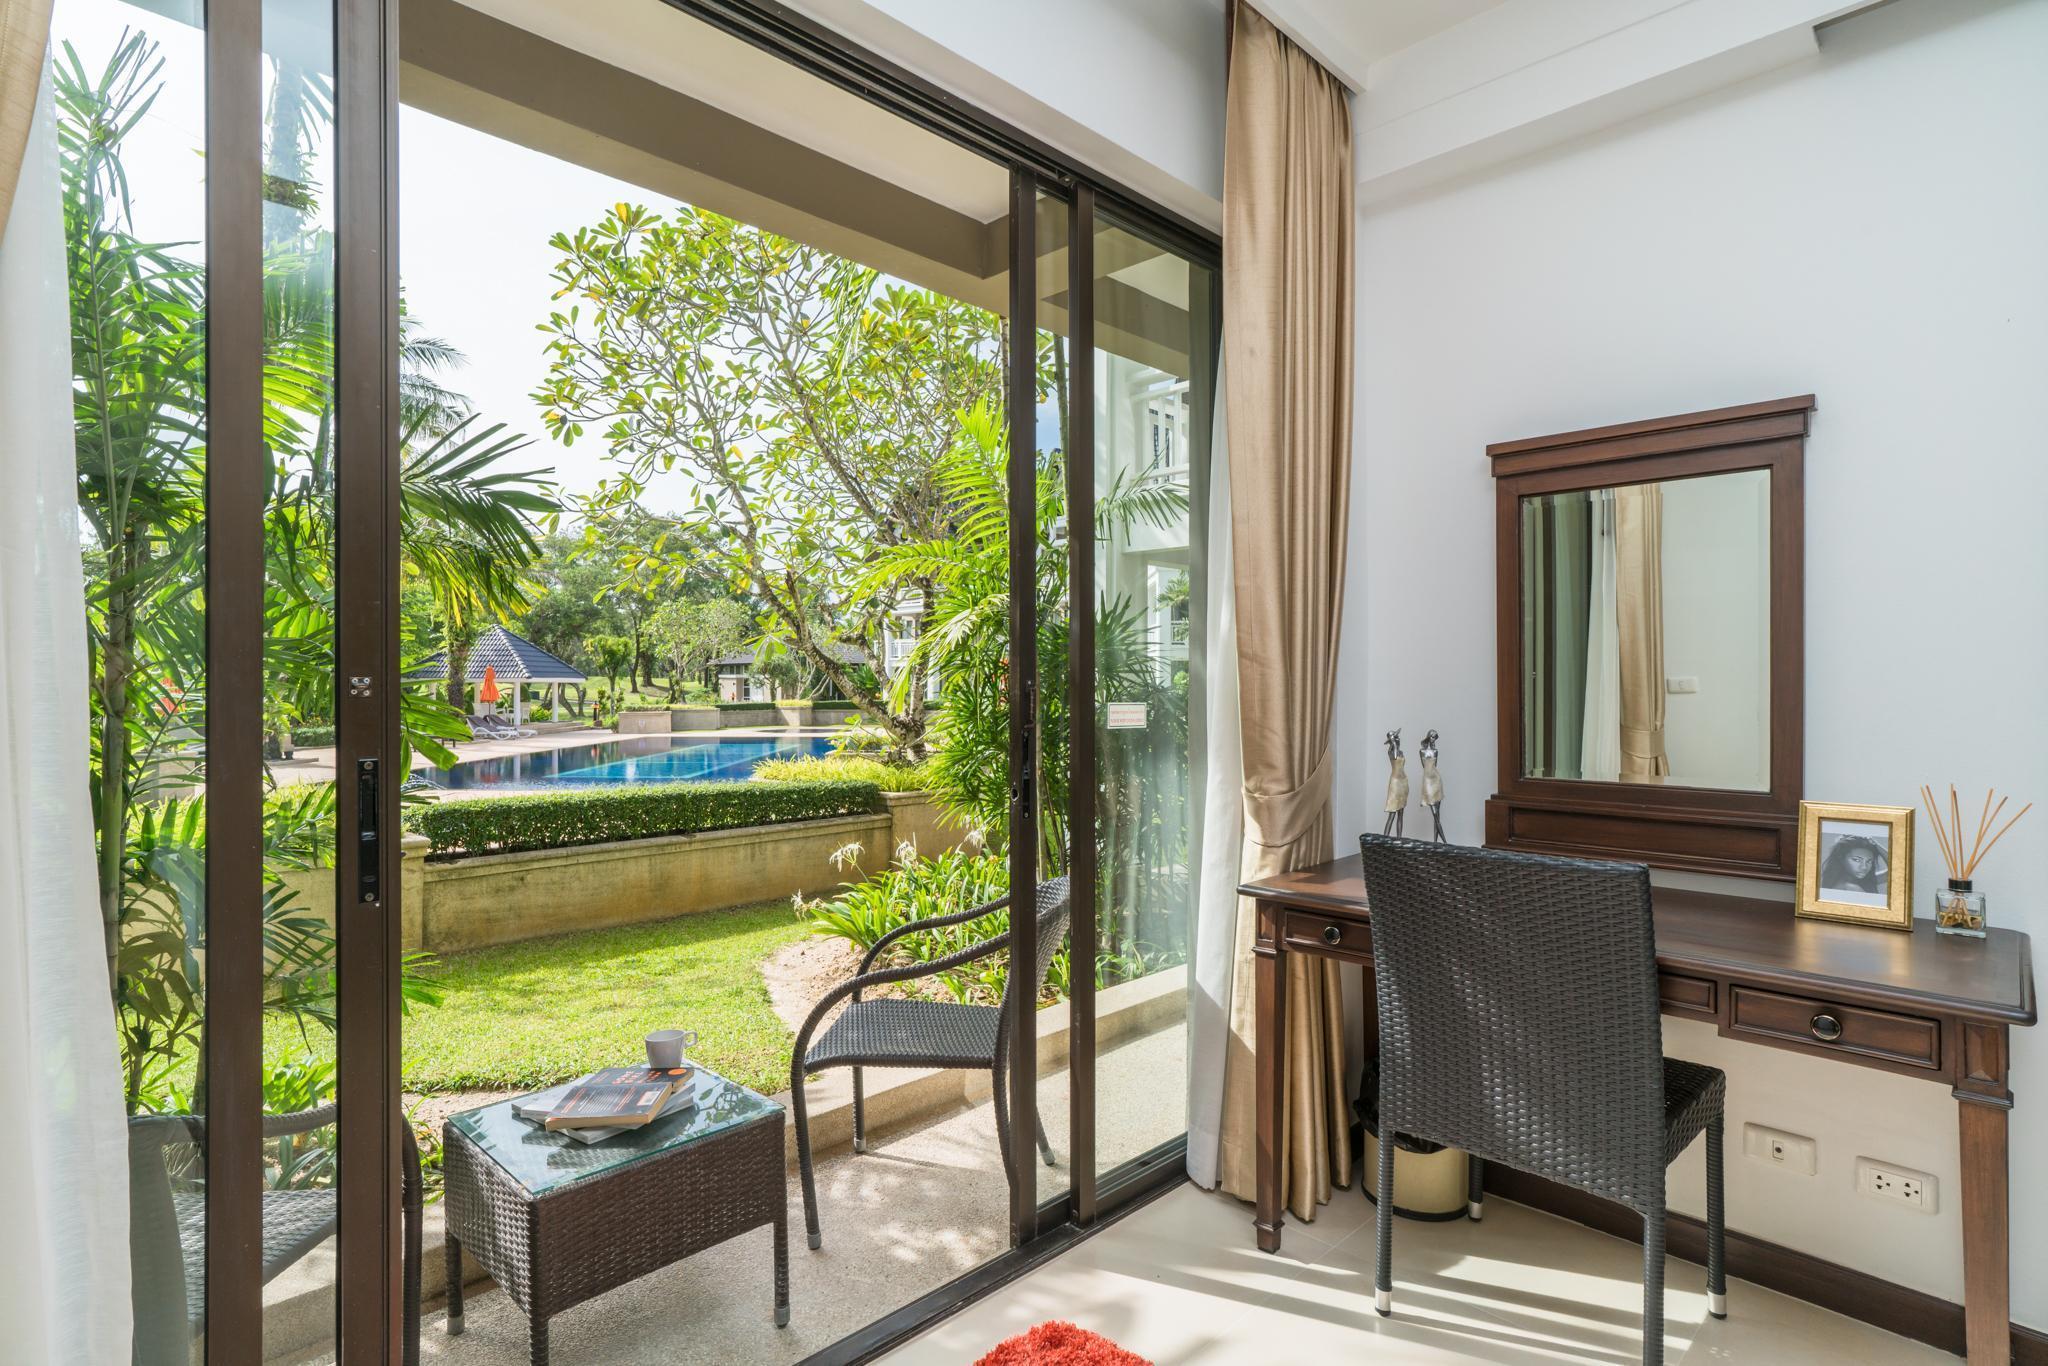 Fantastic Allamanda Room No.3122 Laguna Phuket บ้านเดี่ยว 2 ห้องนอน 1 ห้องน้ำส่วนตัว ขนาด 65 ตร.ม. – บางเทา